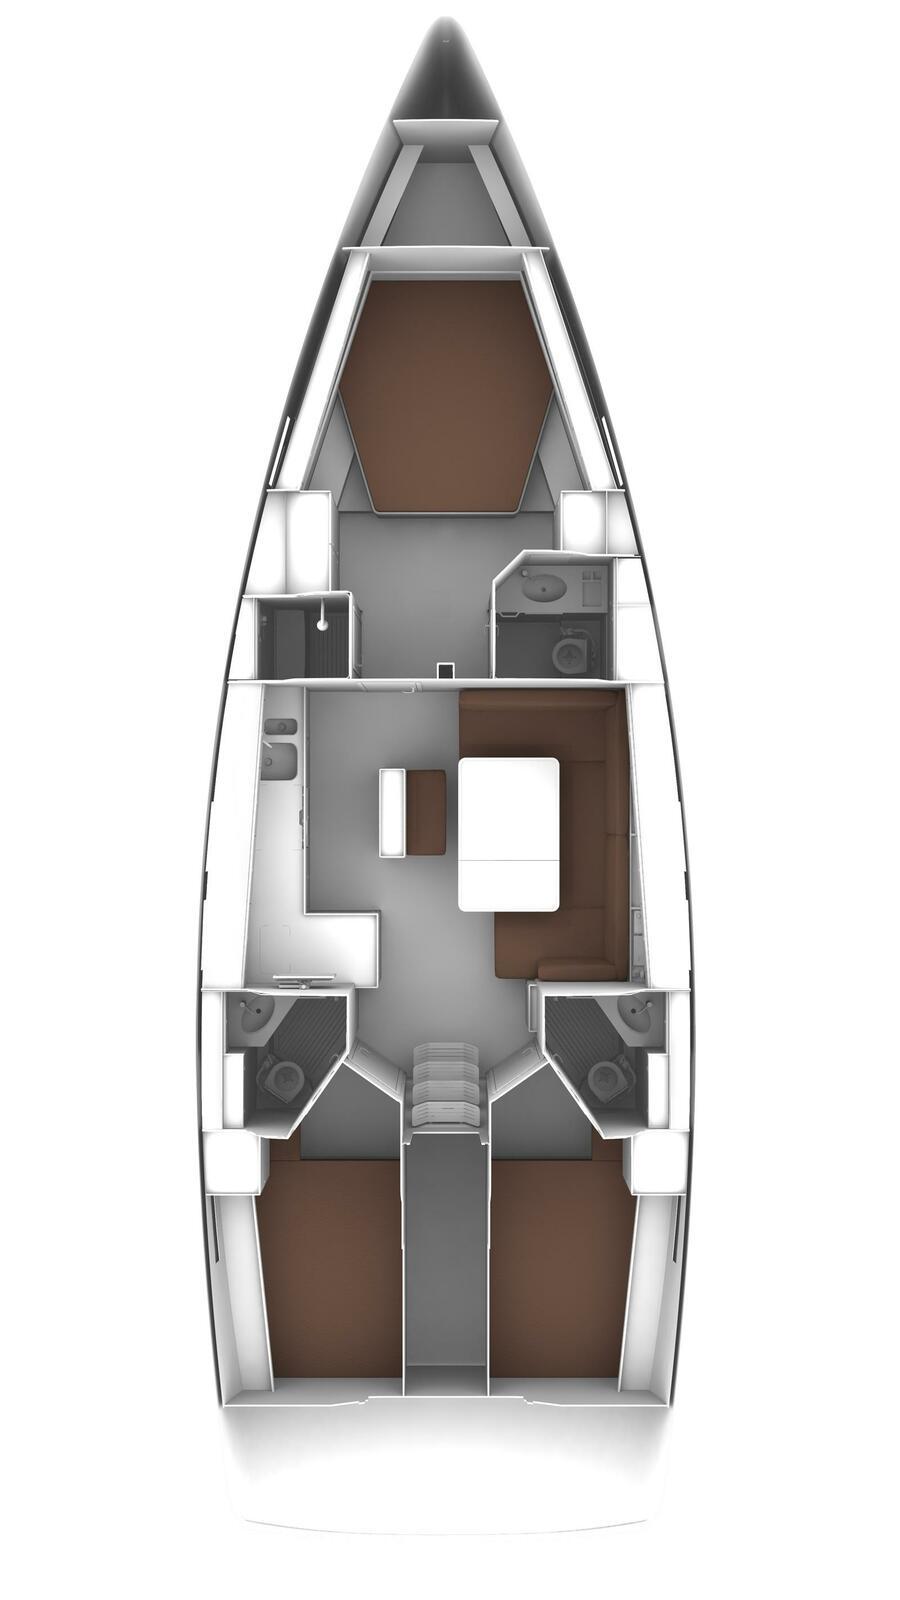 Bavaria Cruiser 46 - 4 cab. (Amsterdam)  - 2